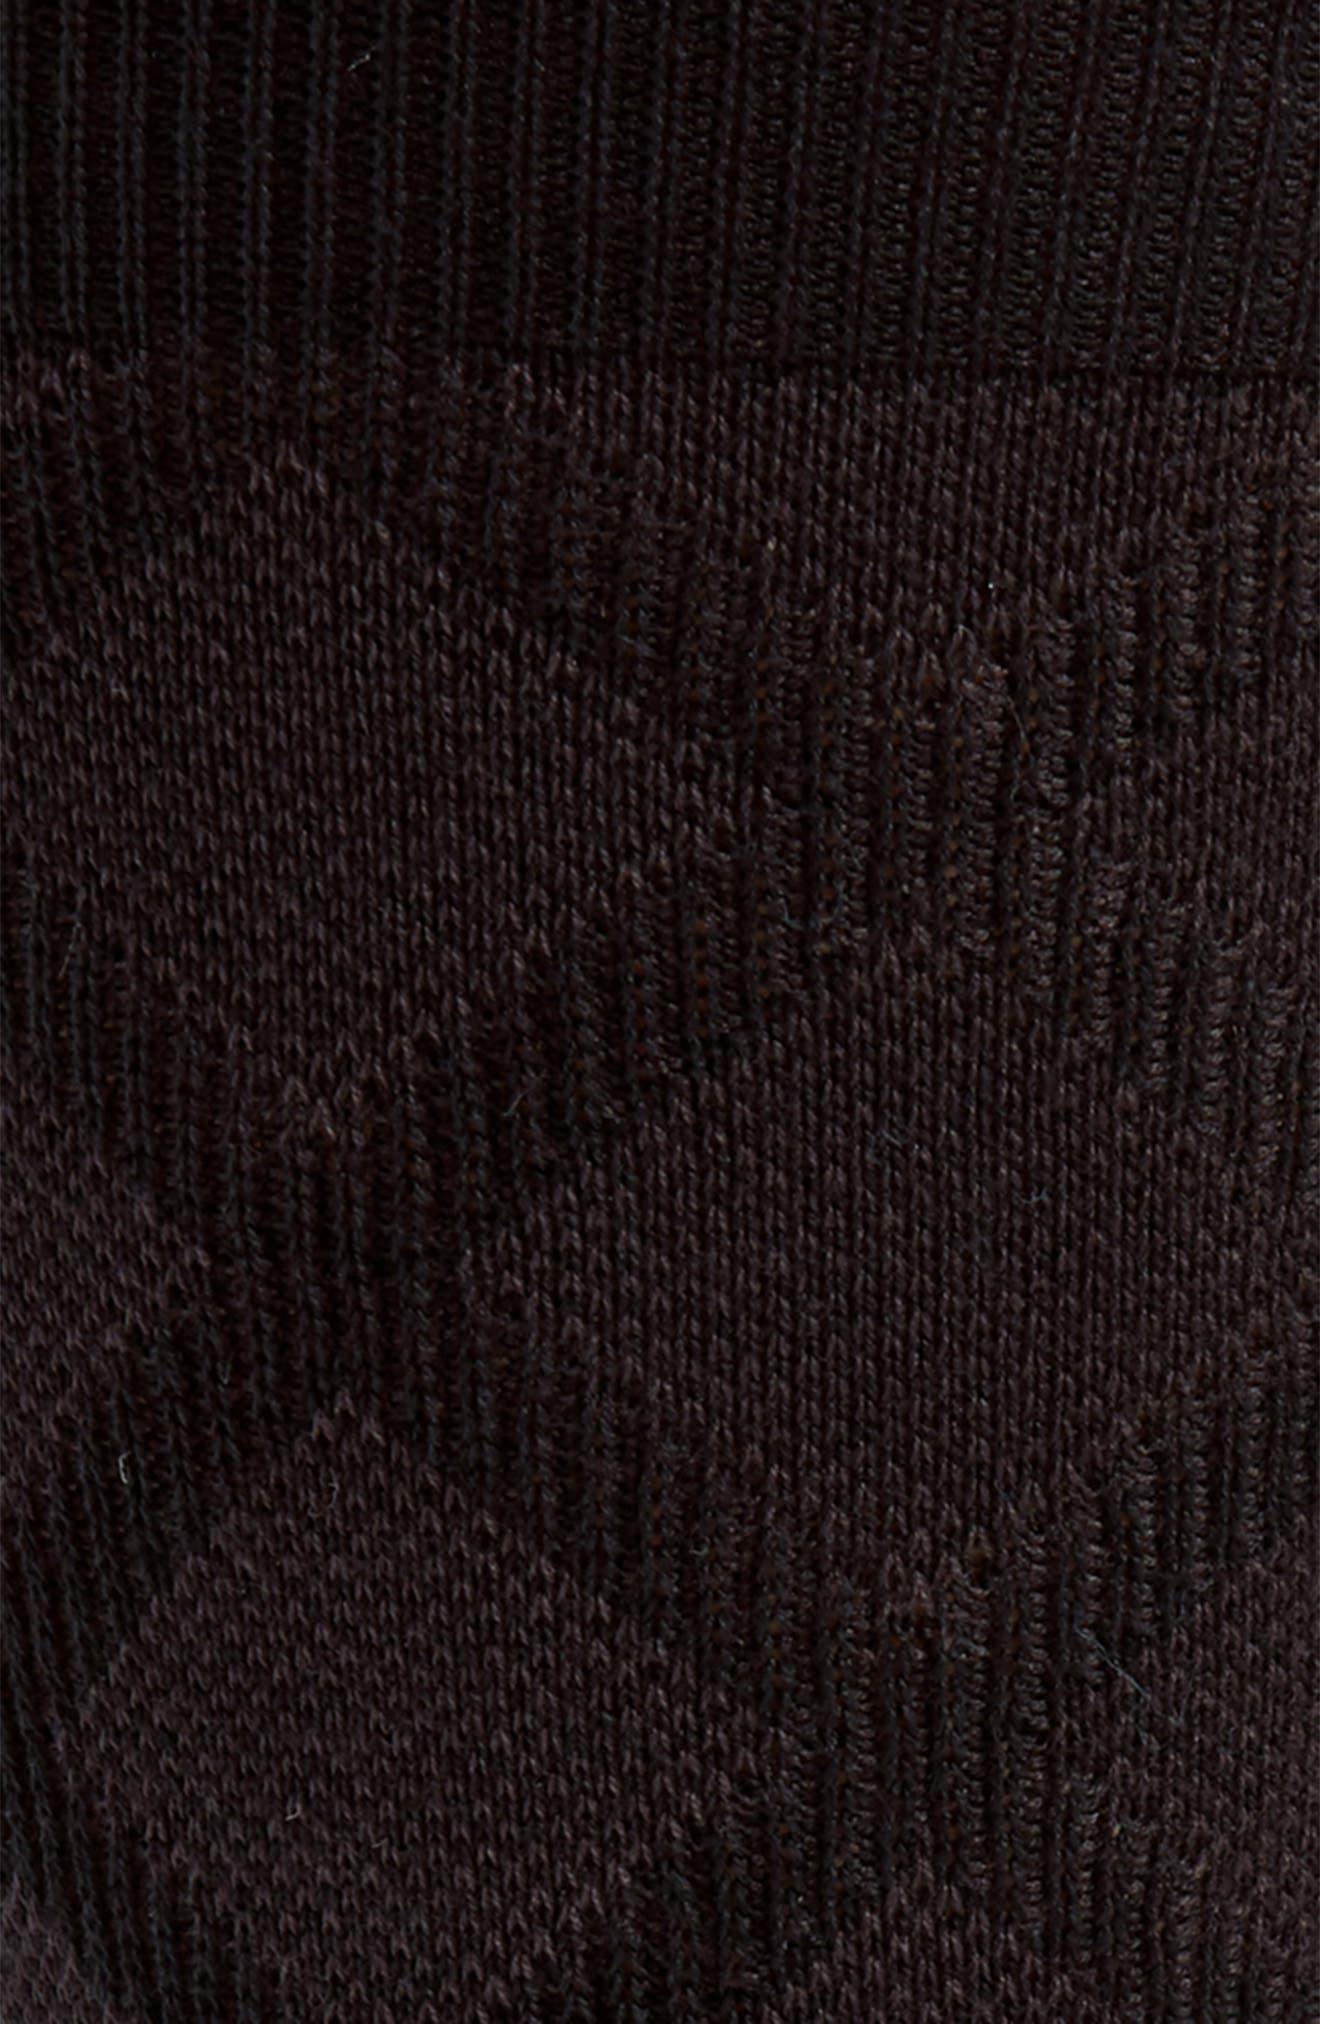 Diamond Grid Socks,                             Alternate thumbnail 2, color,                             BLACK